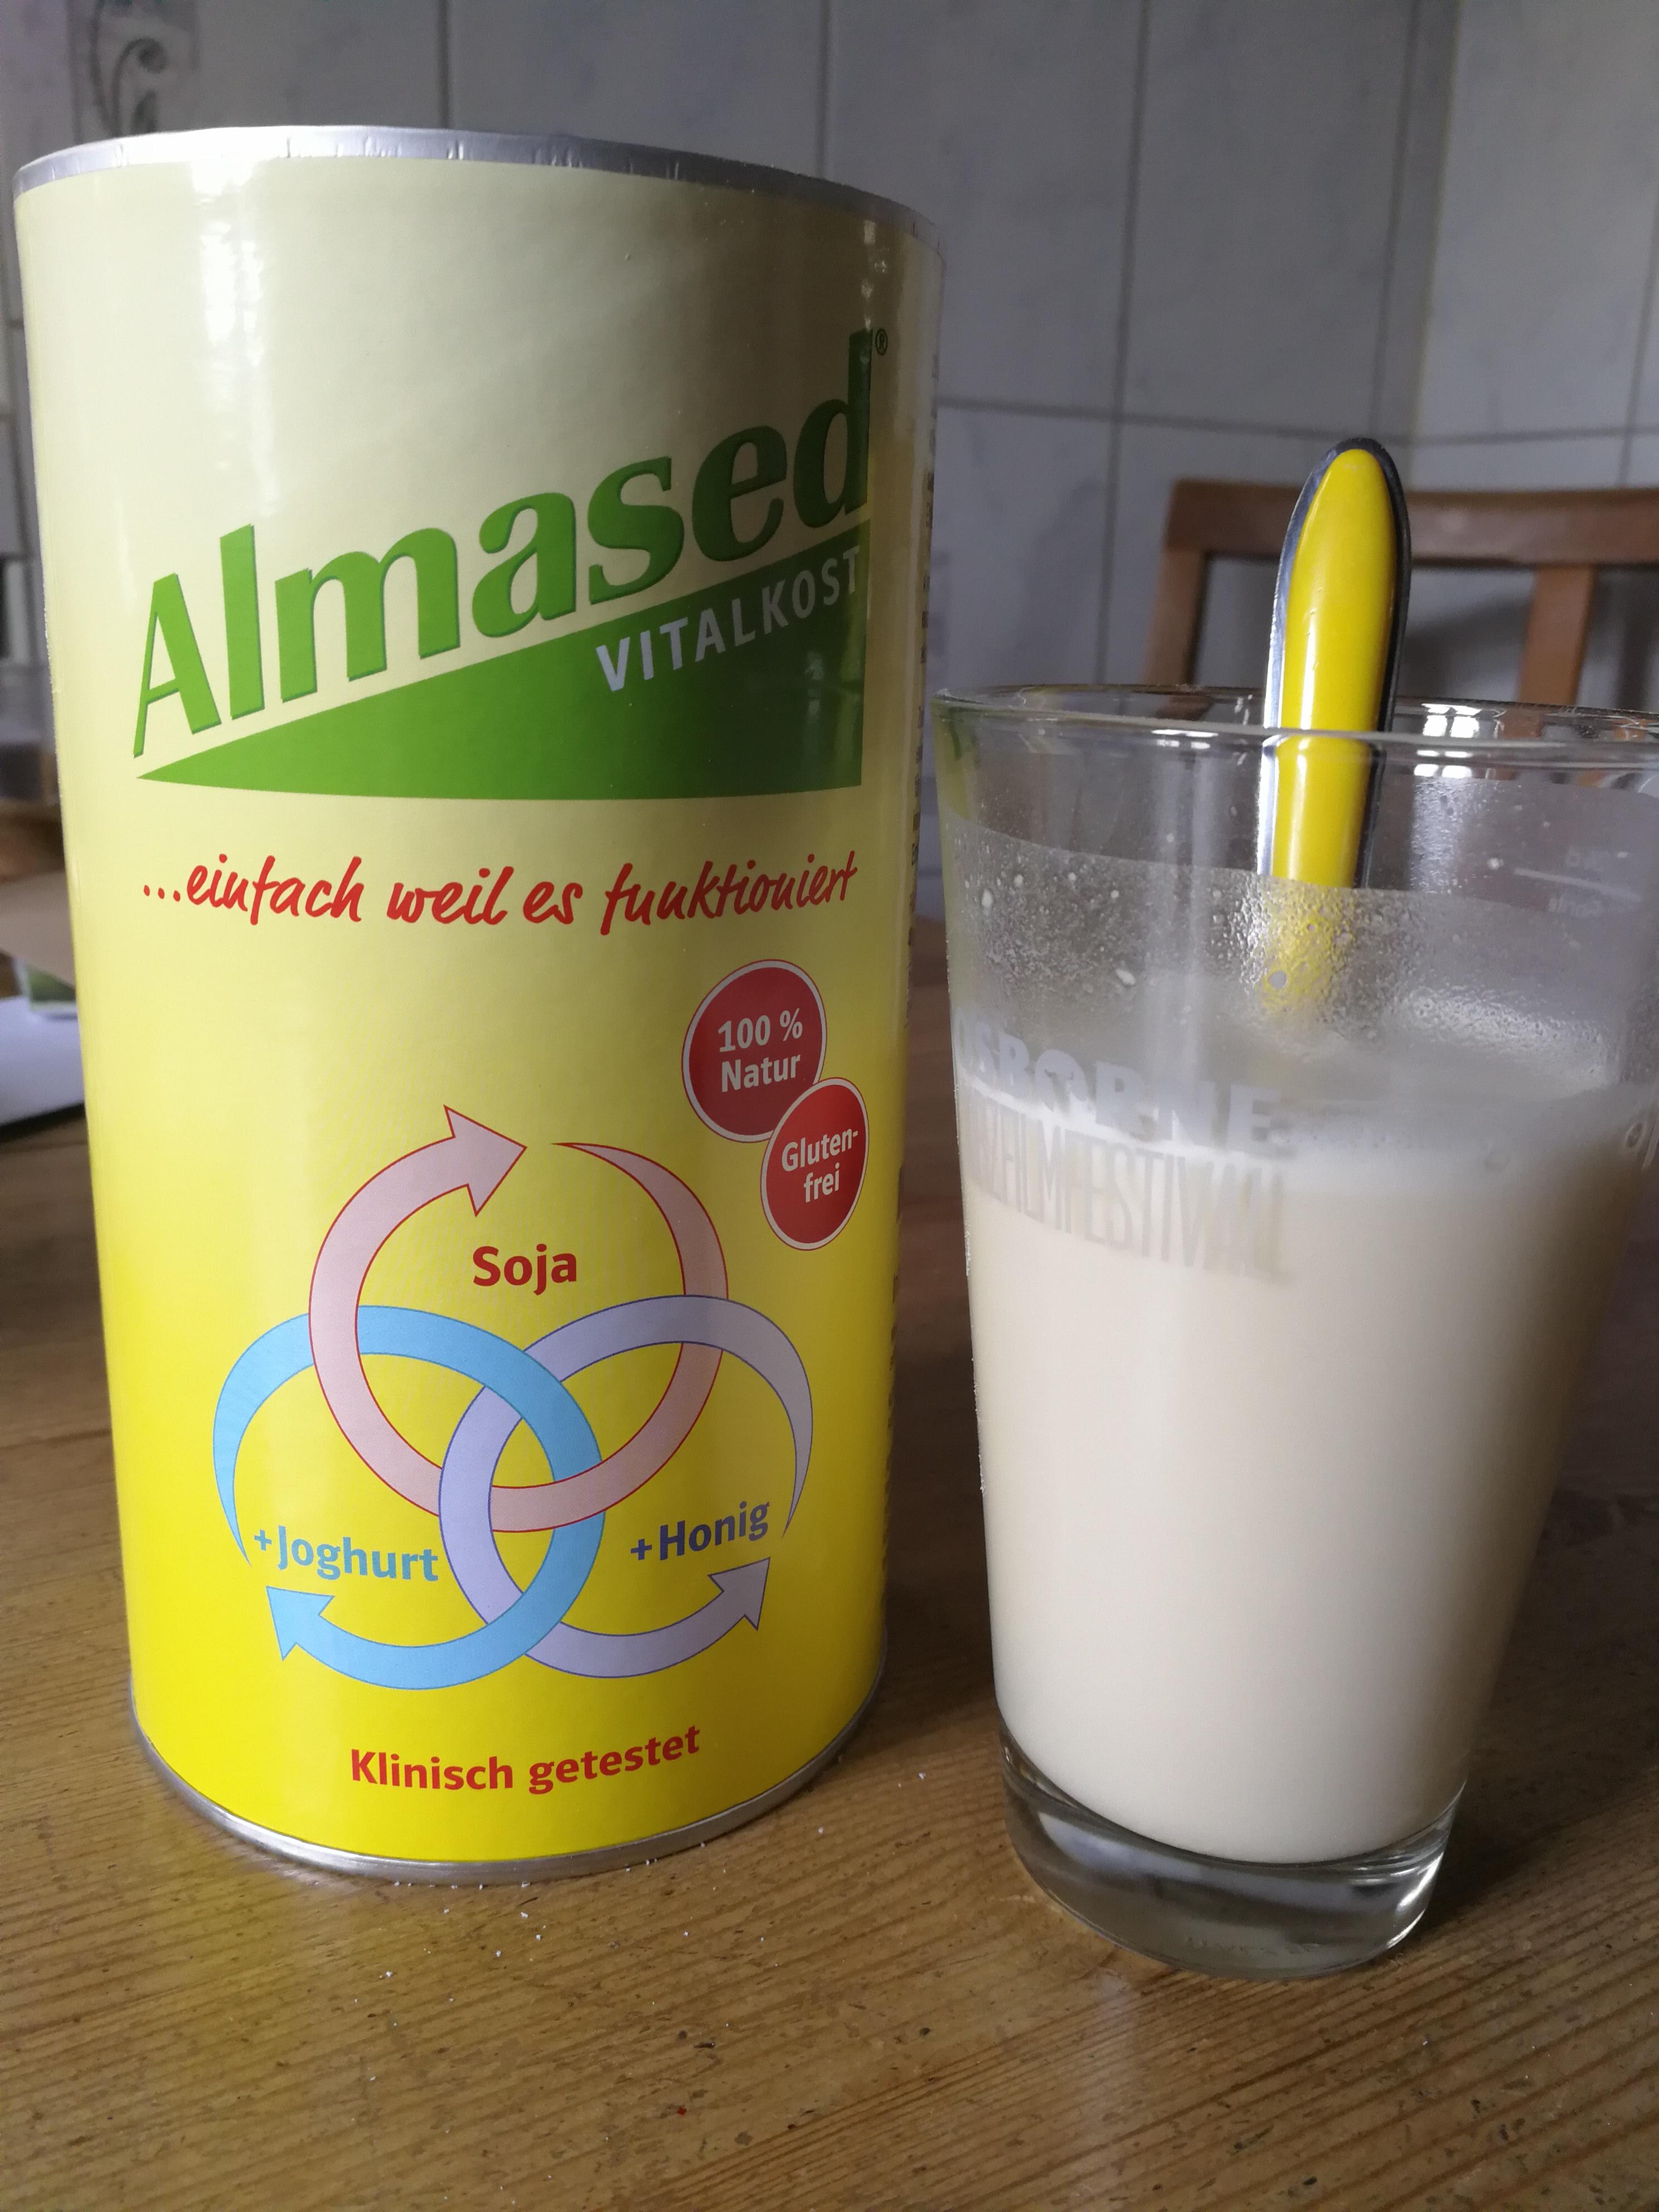 Almased - Wieso so viel Wasser?